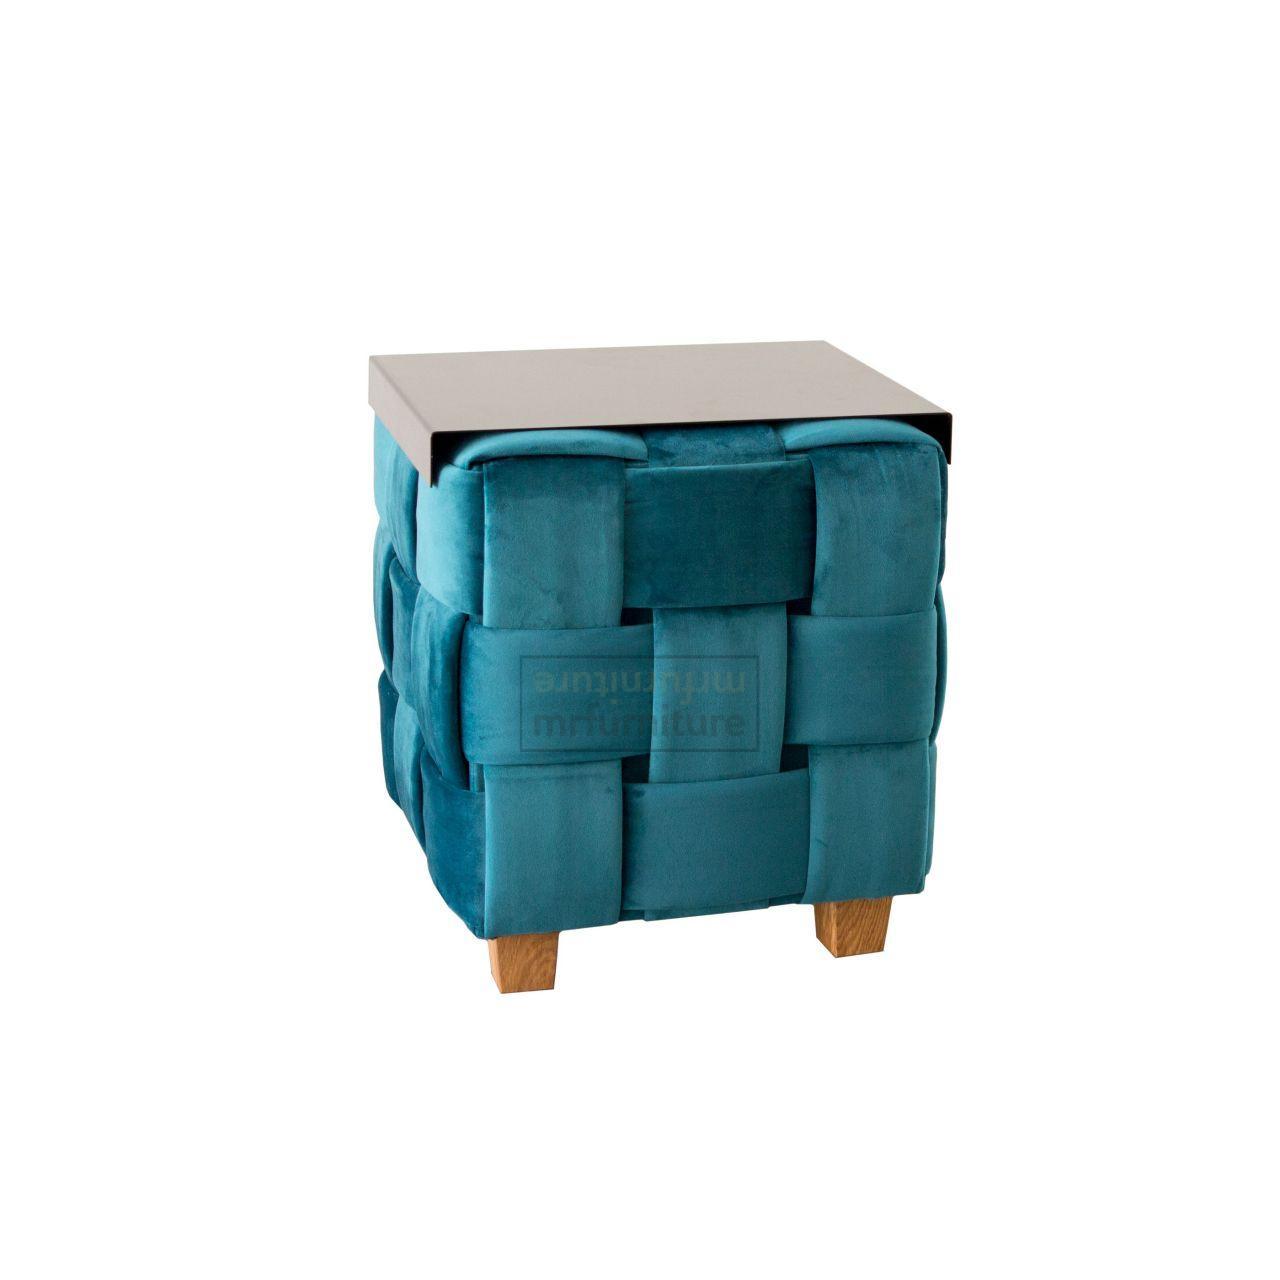 Ordinaire Soft_furniture_sofa Bed_transformer_www.mrfurniture.eu_light_grey